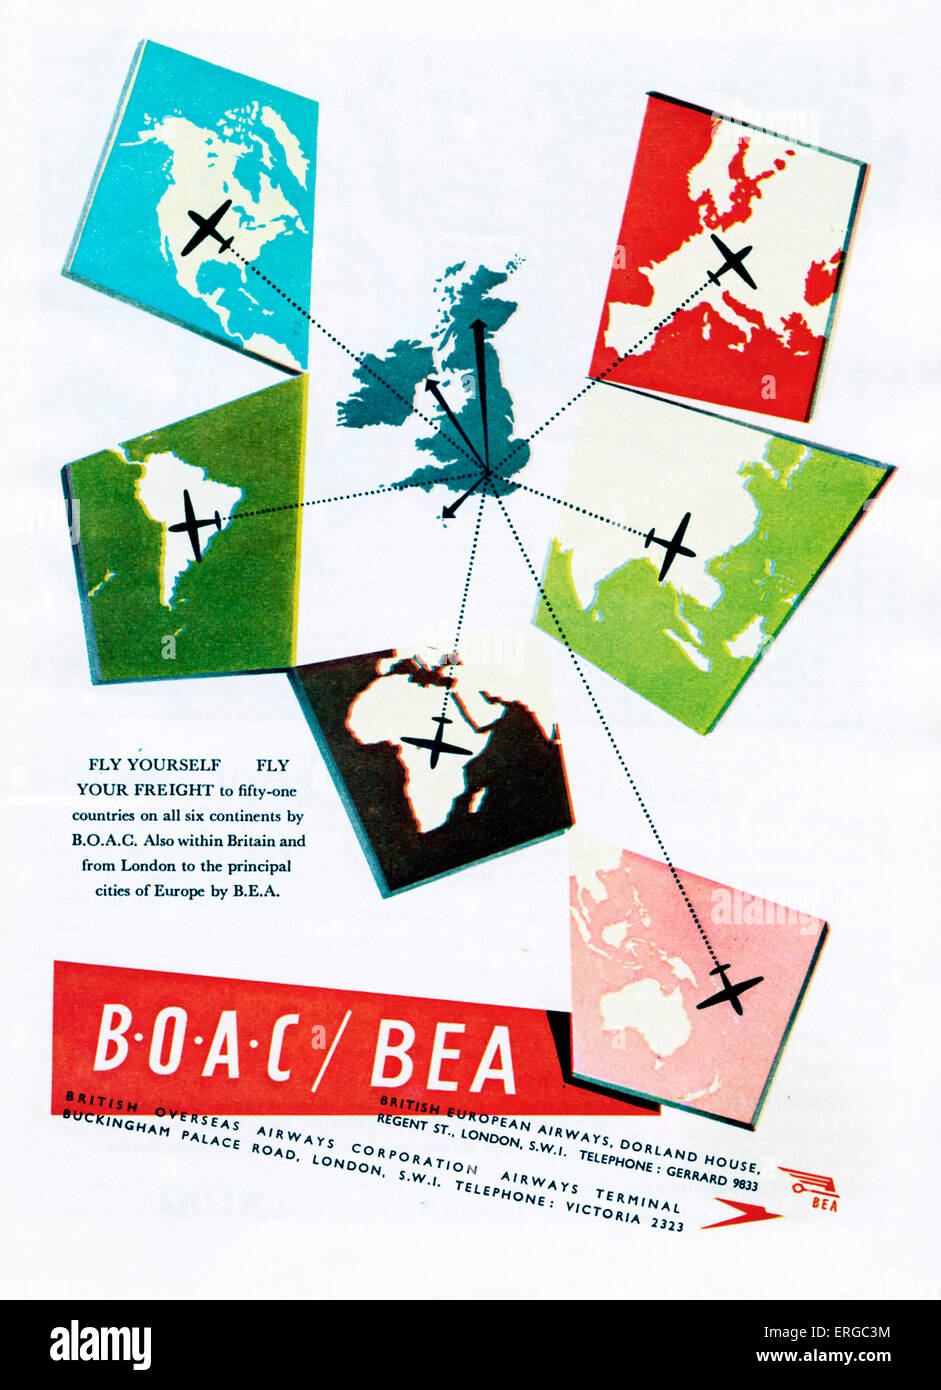 Advertisement for BOAC / BEA, 1950s. BOAC: British Overseas Airways Corporation. BEA: British European Airways. - Stock Image